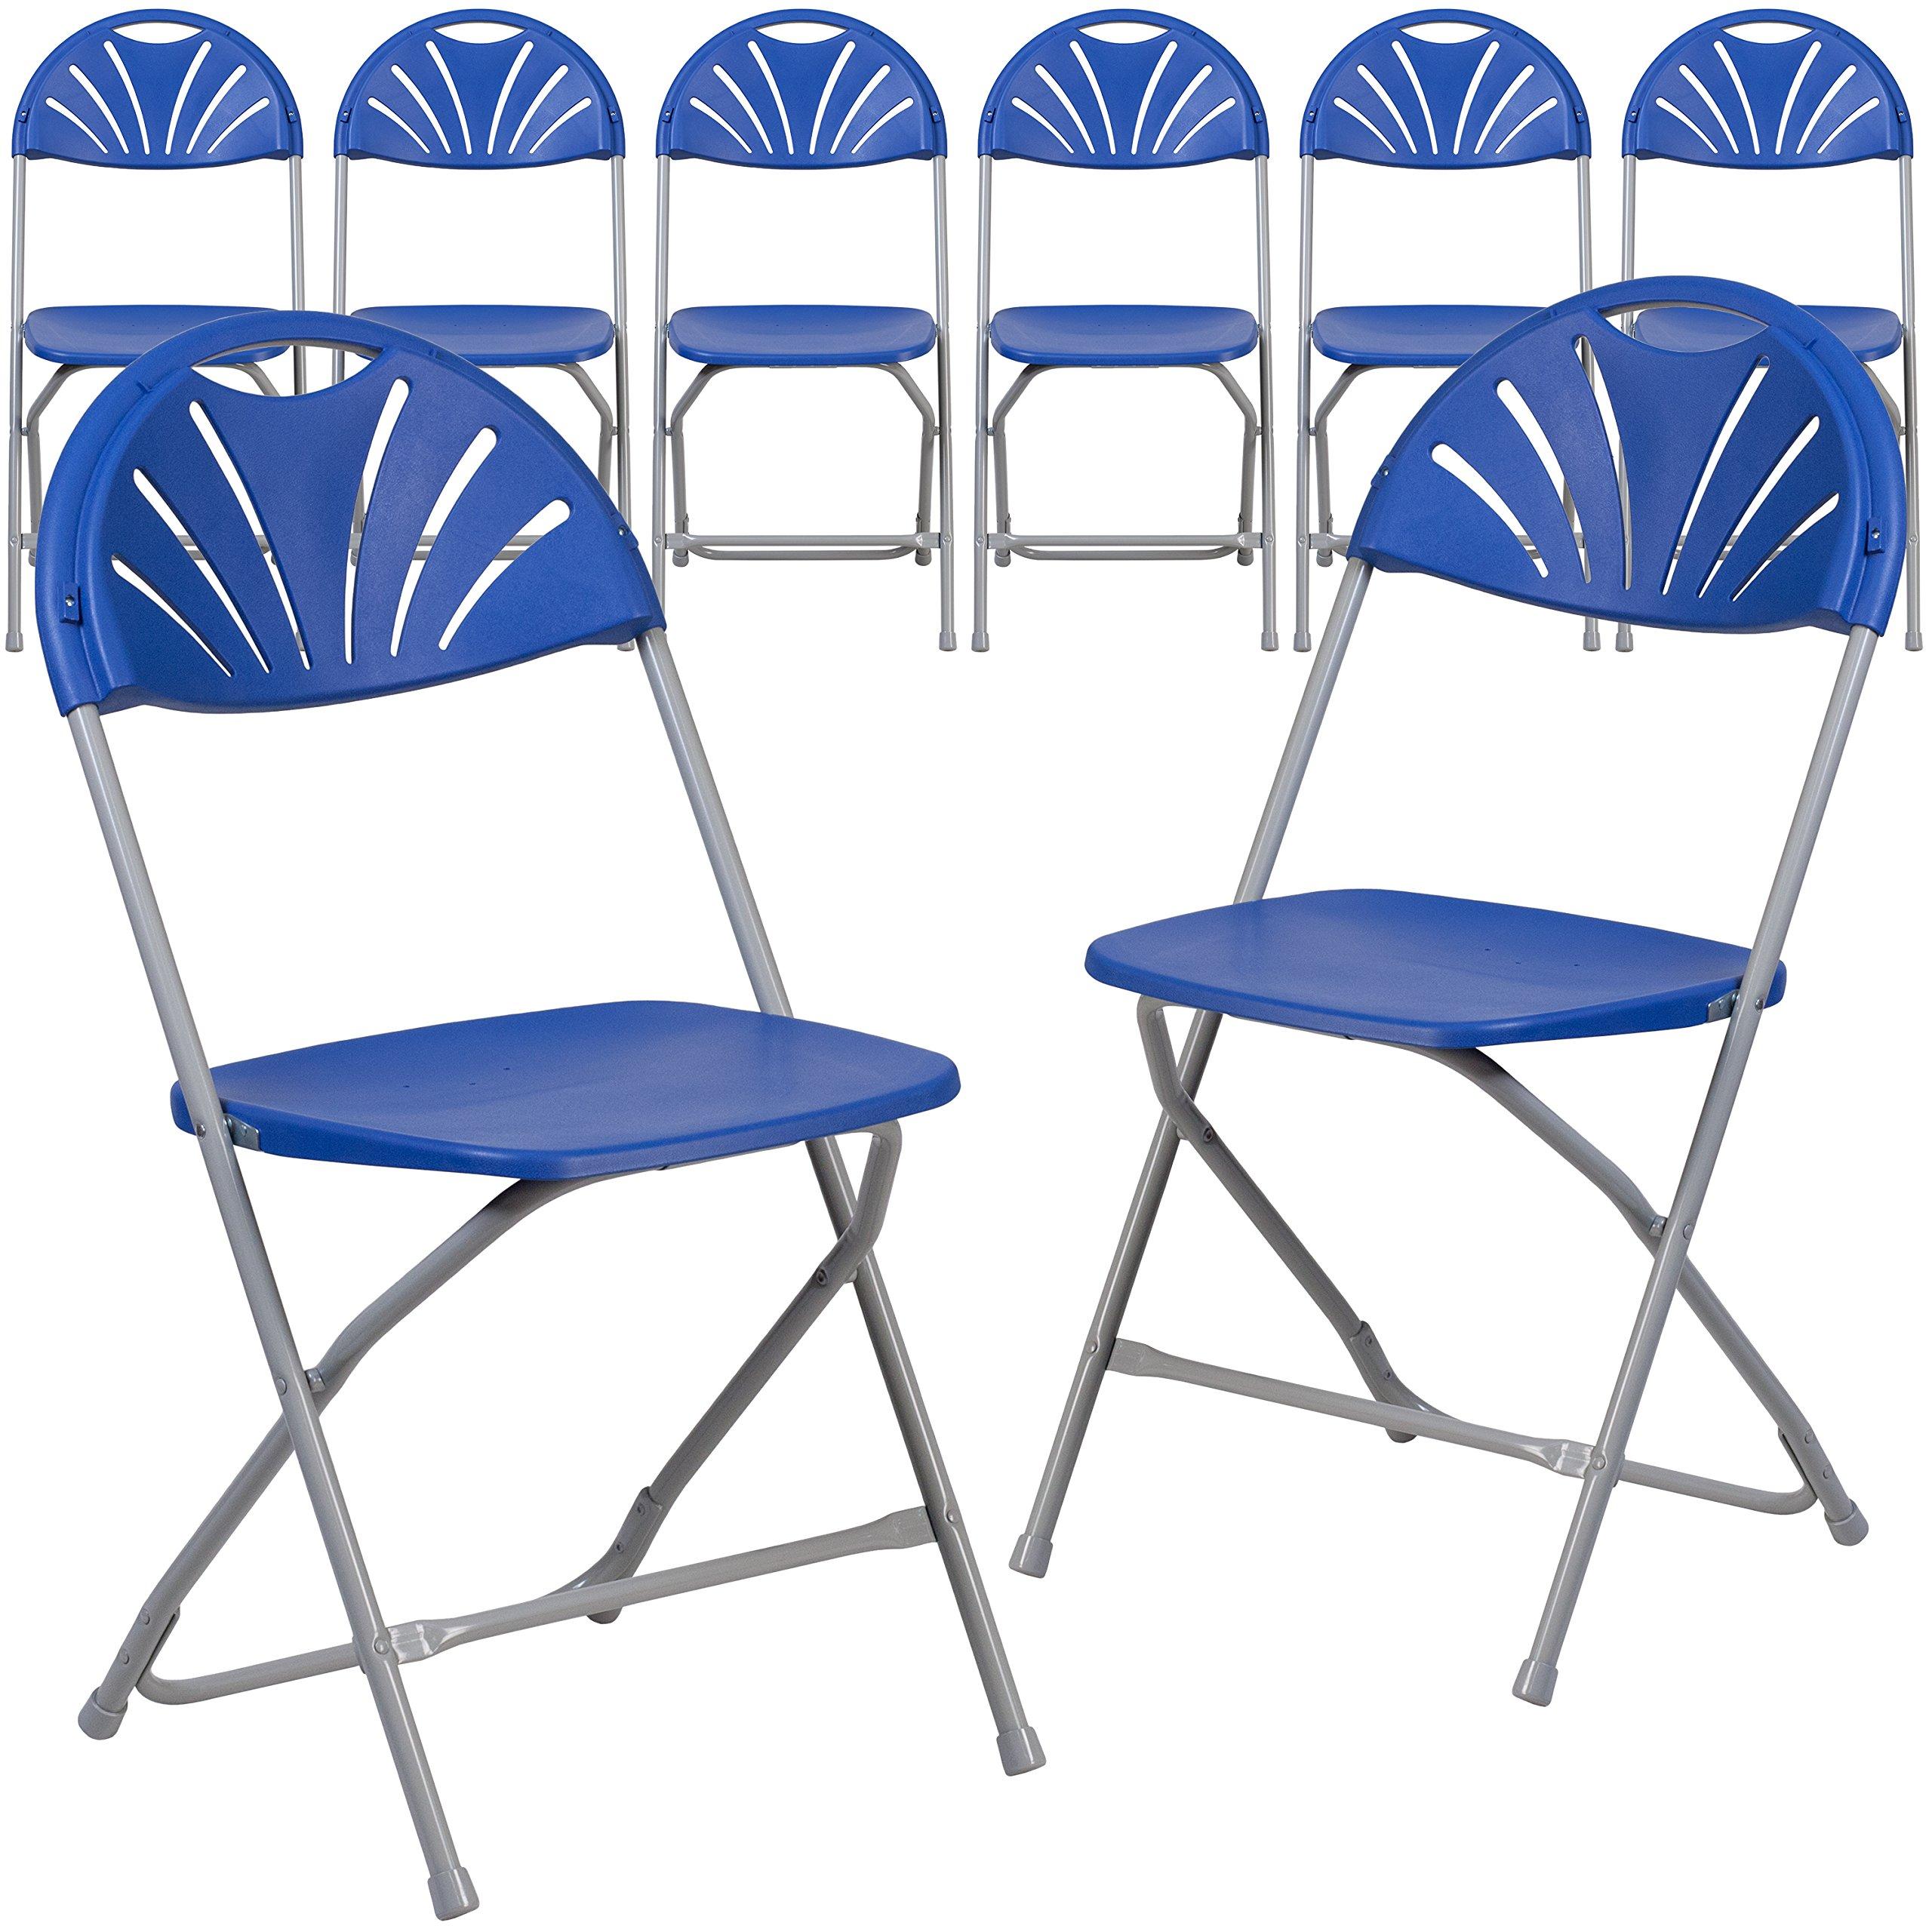 Flash Furniture 8 Pk. HERCULES Series 650 lb. Capacity Blue Plastic Fan Back Folding Chair by Flash Furniture